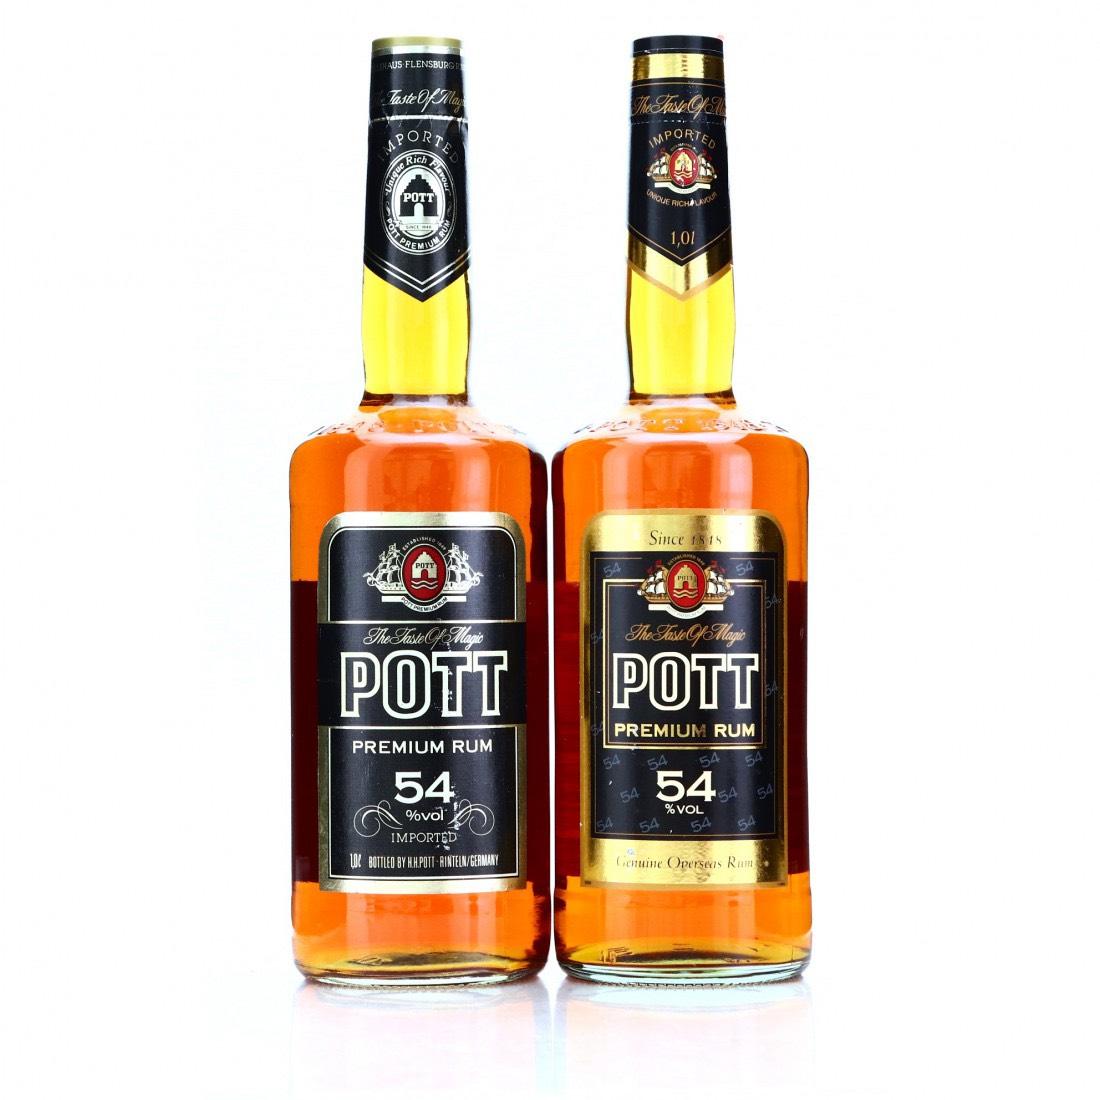 Bottle image of Der Gute Pott Echter Übersee Rum